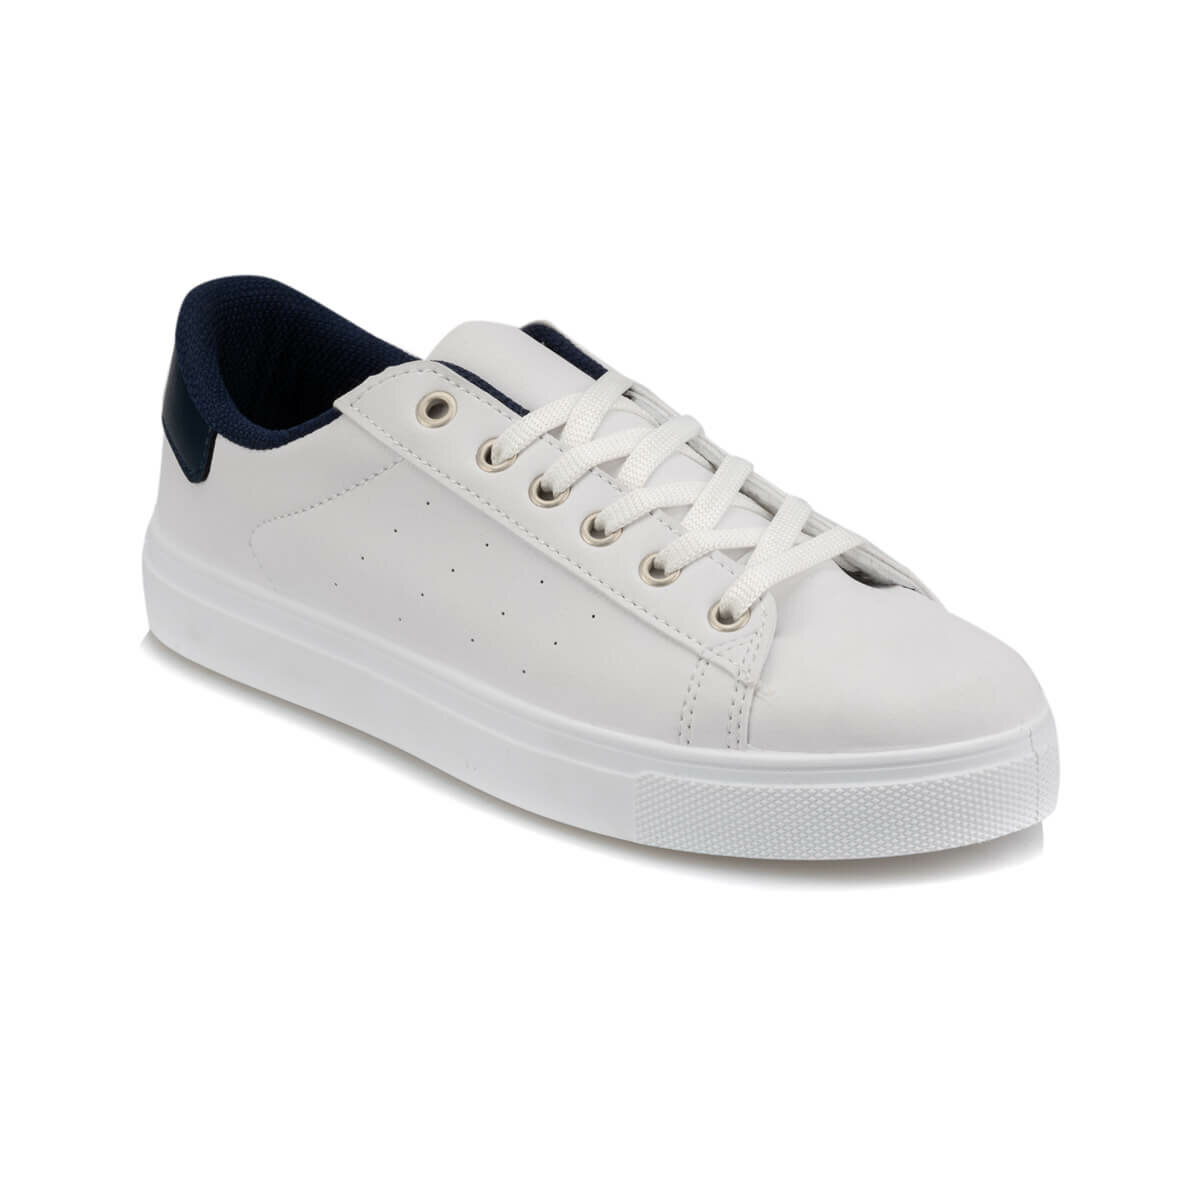 FLO 92.354921.Z Navy Blue Women 'S Sneaker Shoes Polaris